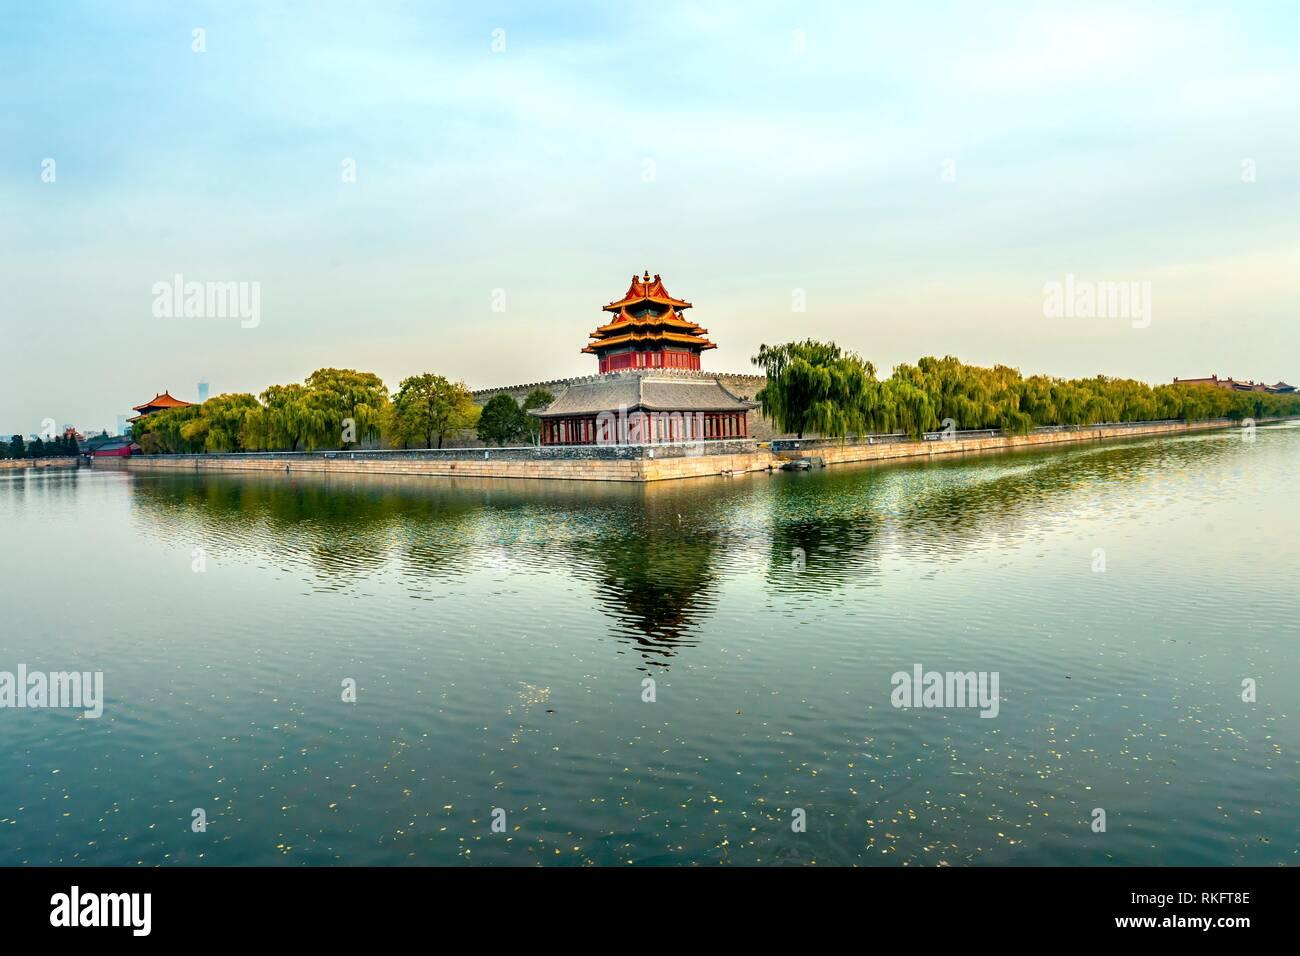 Pfeil Watch Tower Gugong Verbotene Stadt Graben Canal Plaace Mauer Peking Chinas Kaiser Palast in den 1600er Jahren in der Ming Dynastie errichtet wurde. Stockbild